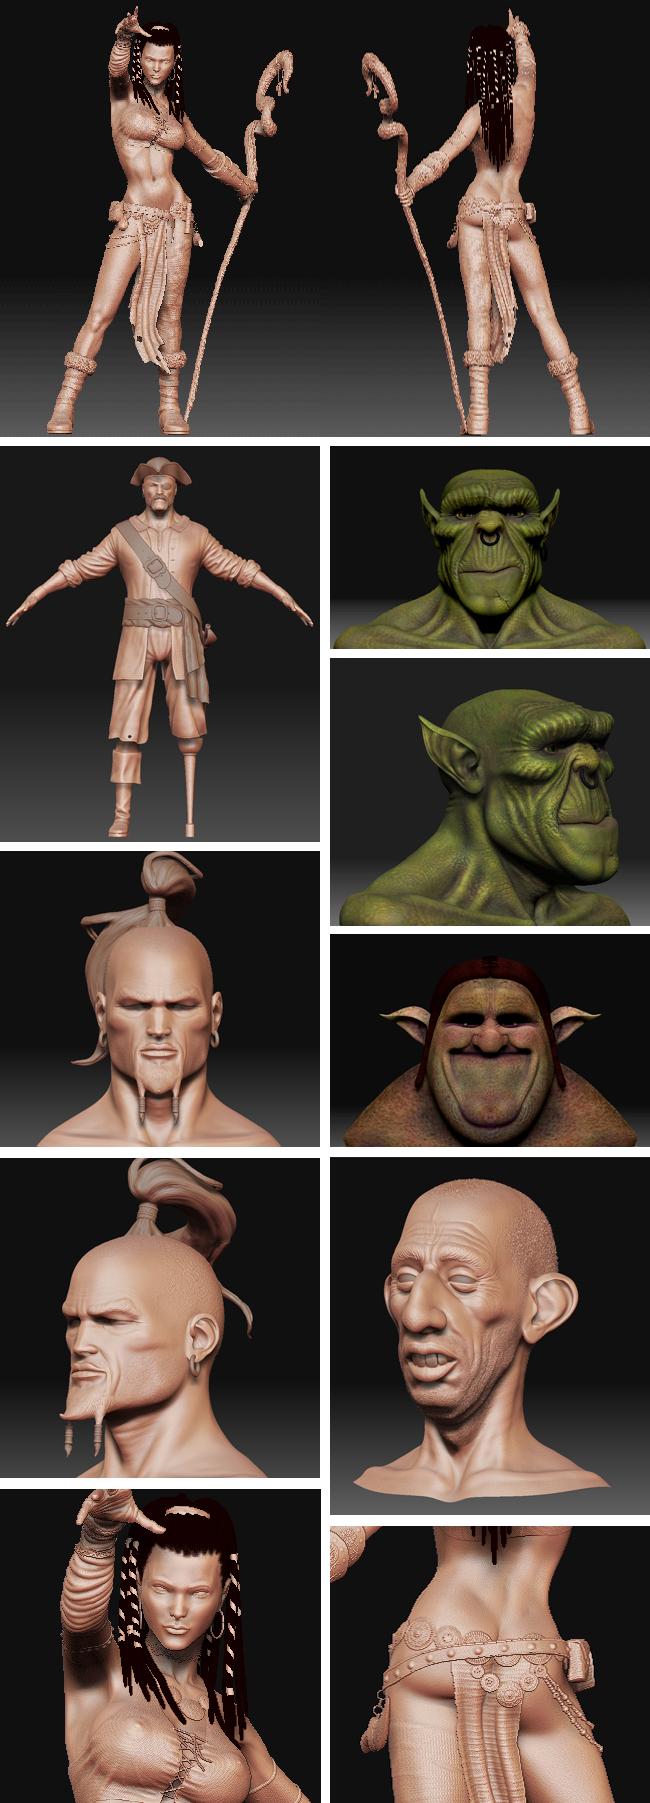 Curso de modelado en 3D con ZBrush en academia C10. Cursos de Verano.